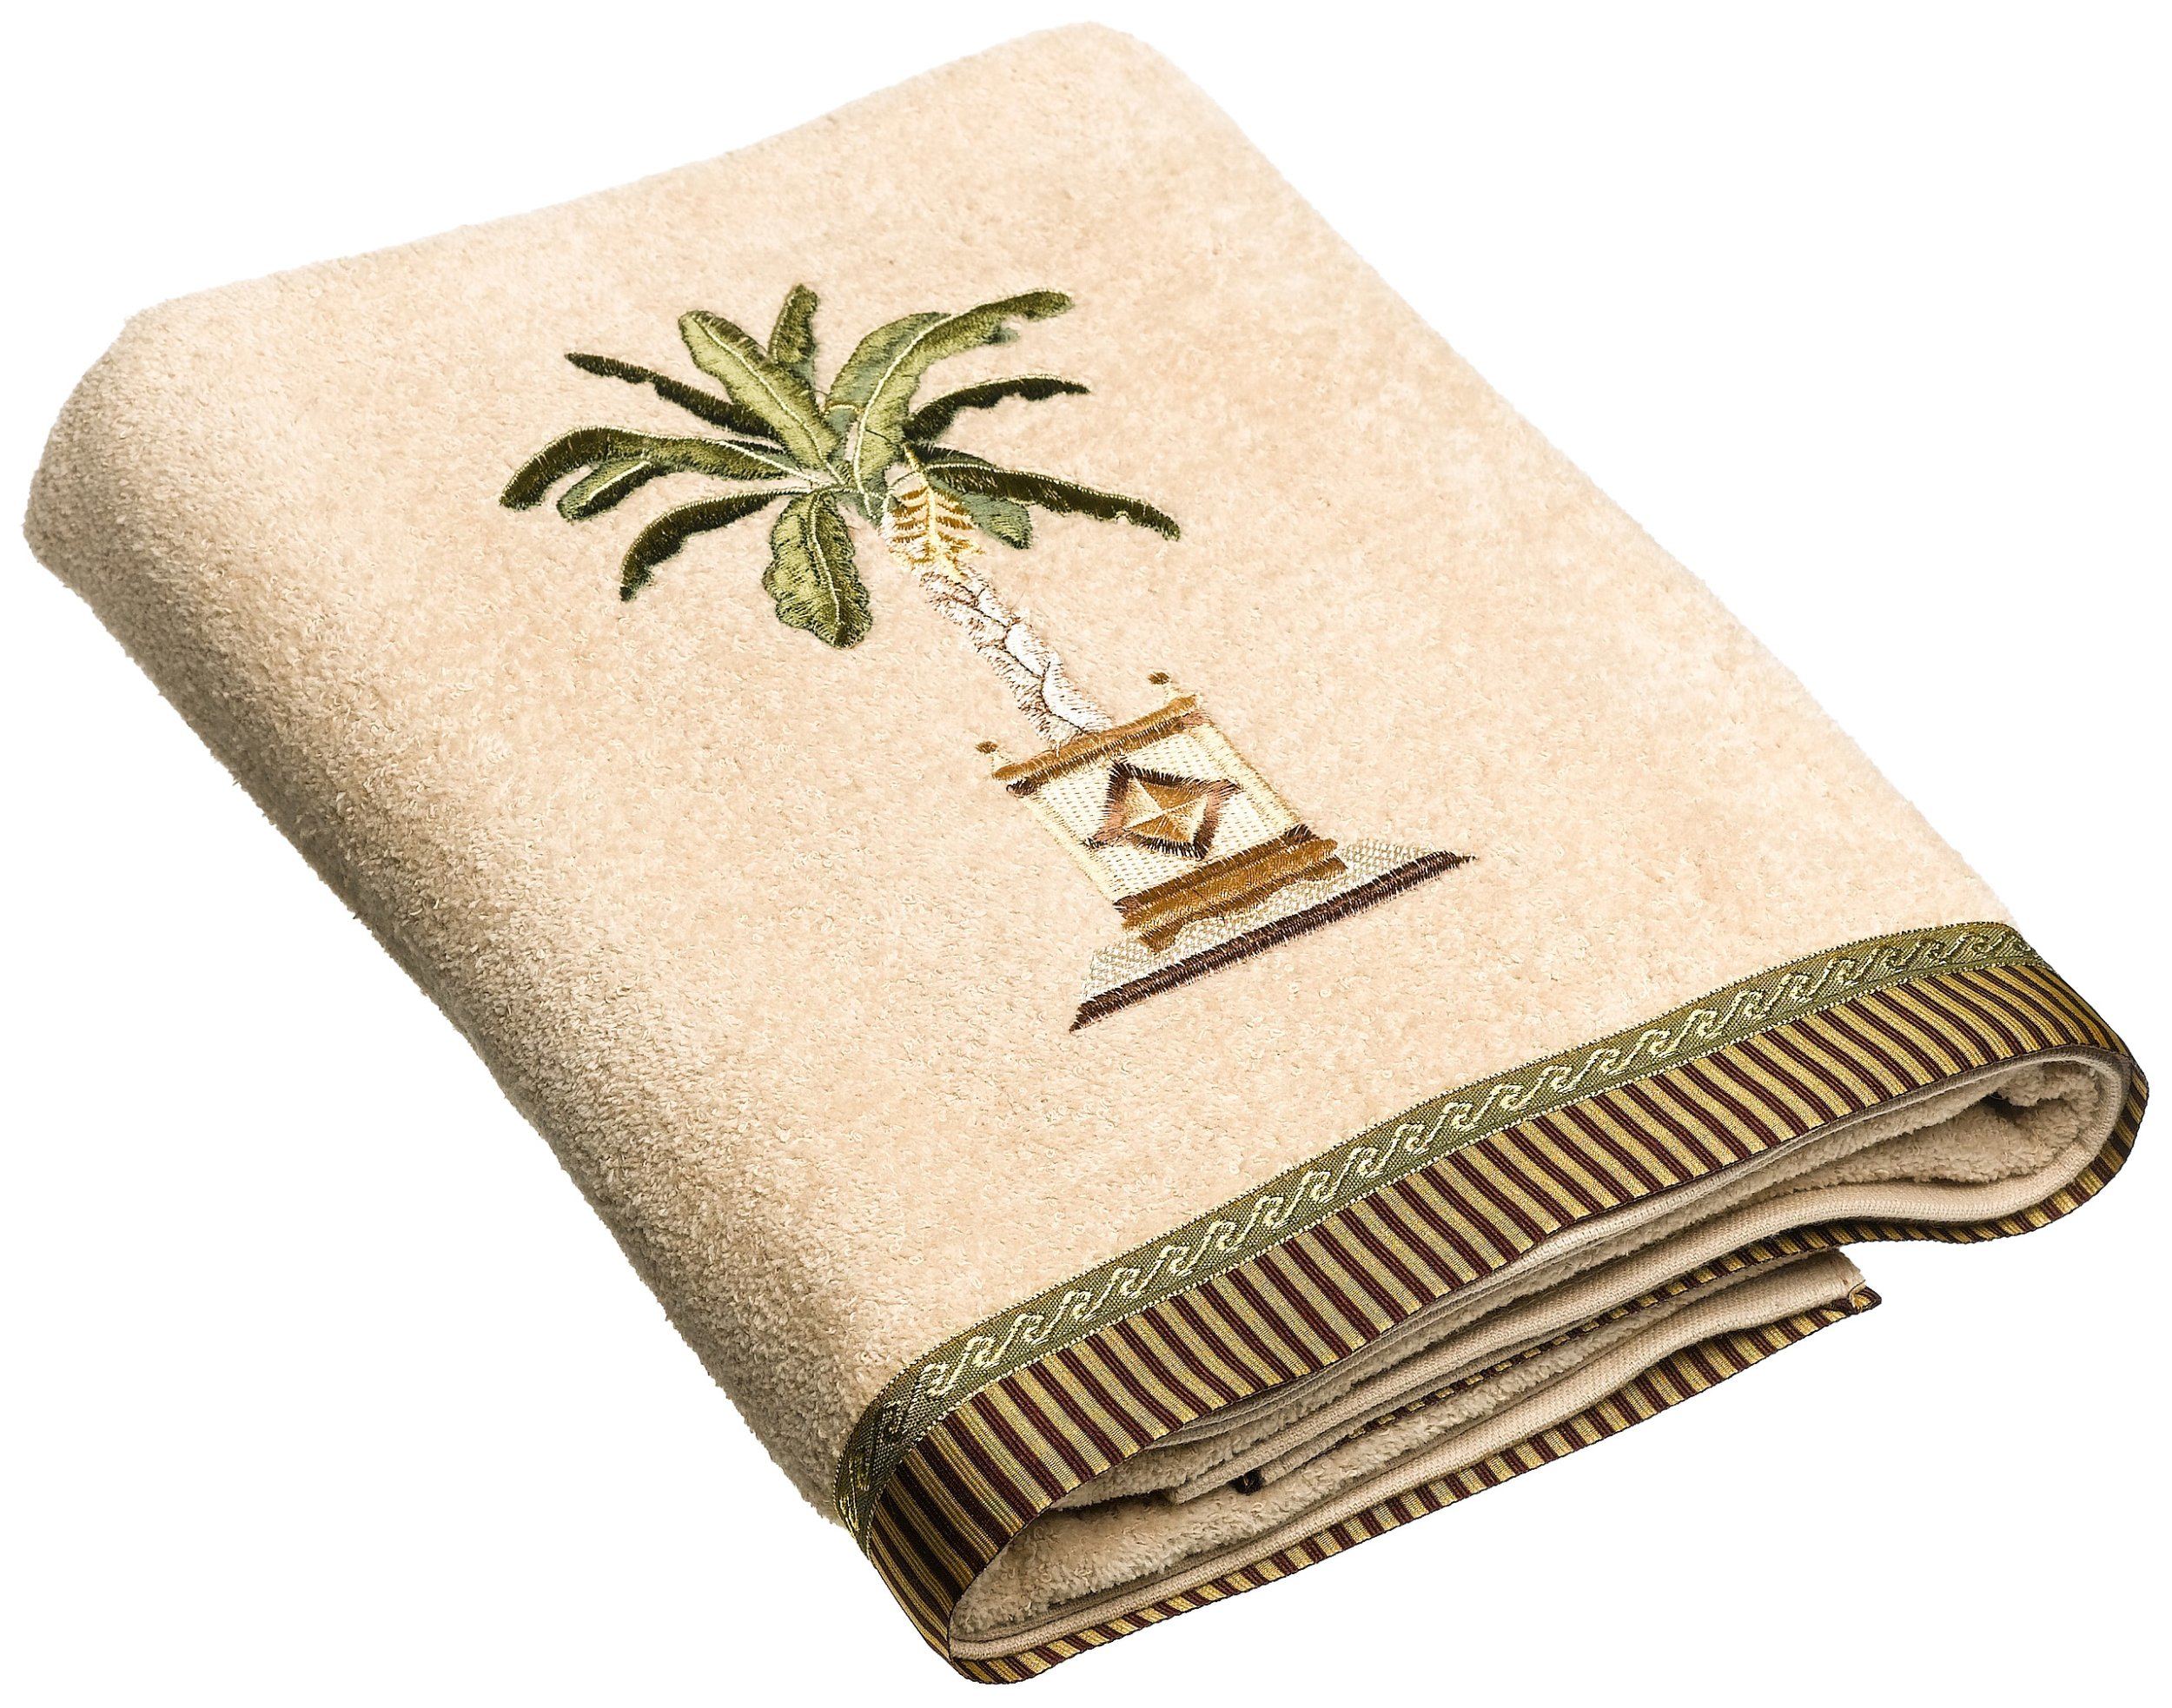 Avanti Linens Banana Palm Bath Towel, Linen by Avanti Linens